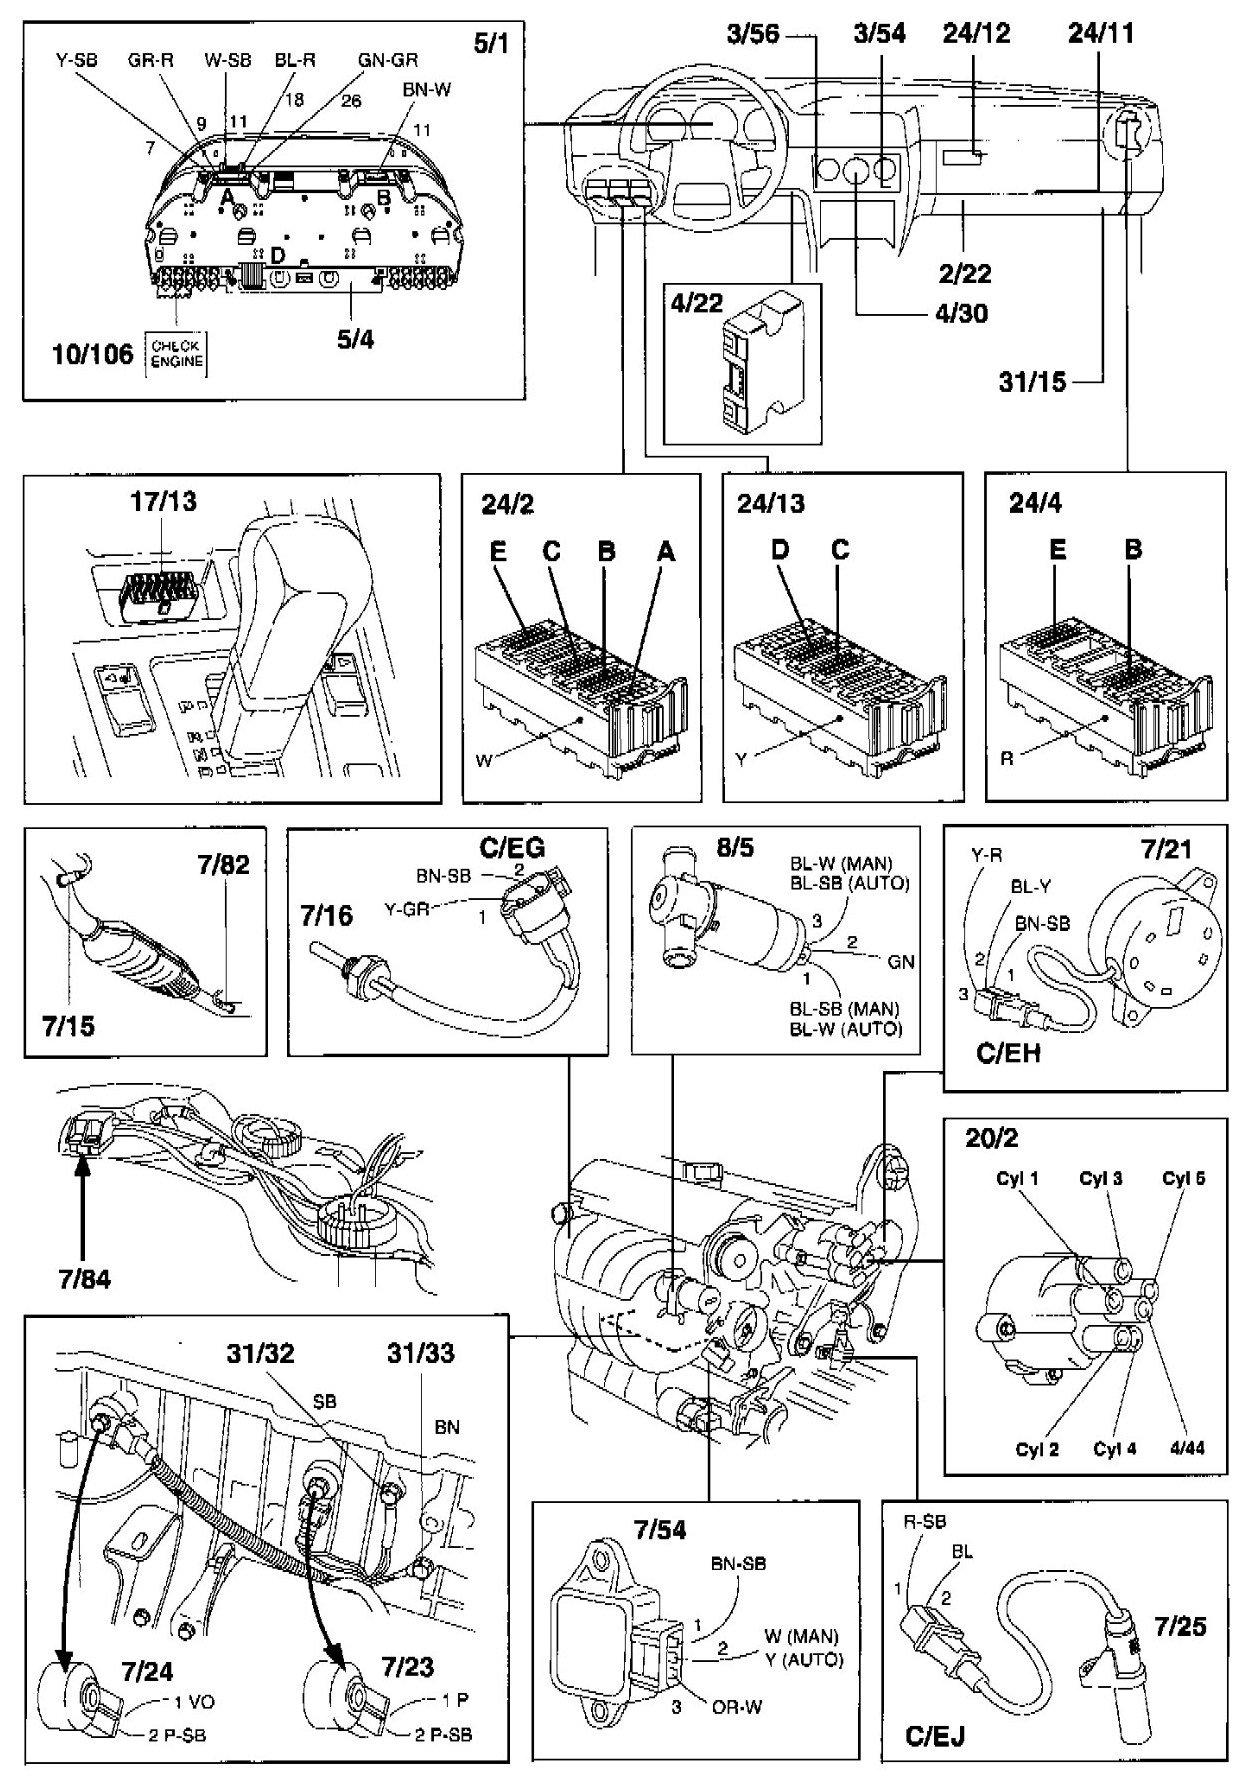 volvo v70 wiring diagram 1998 wiring diagram 1998 volvo v70 glt i have 1998 volvo v70 glt -cooling fan does not come on ...